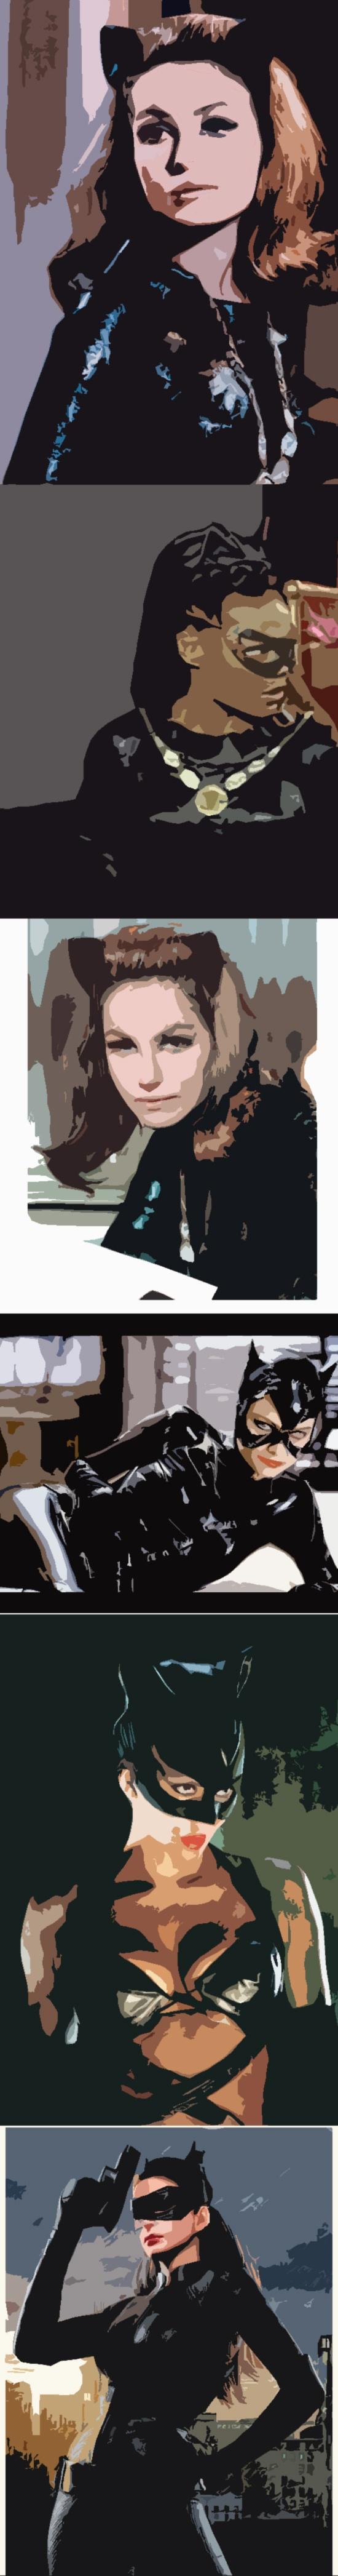 Catwomen Batman Catwoman My Favorite Movies